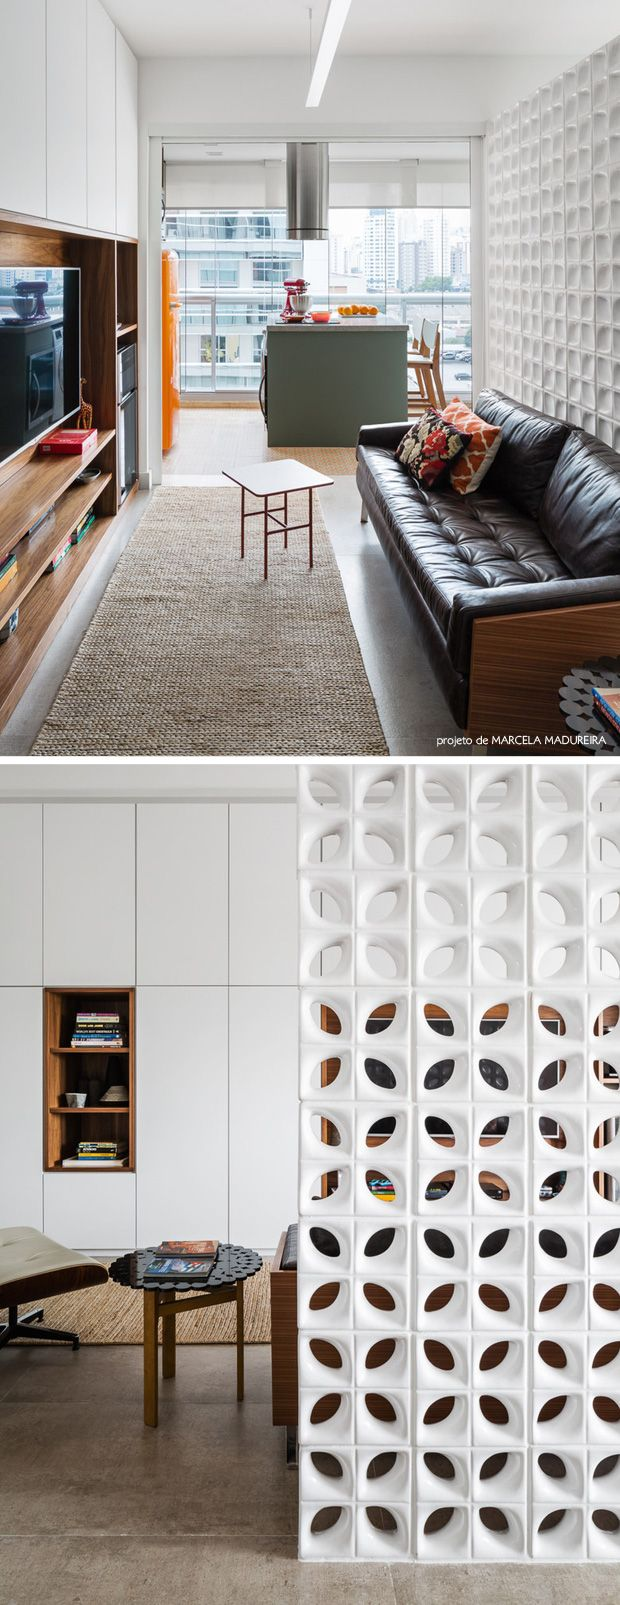 3 room dividers that don't block natural lighting #decor #cobogo #divisorias #casa #paredes #walls